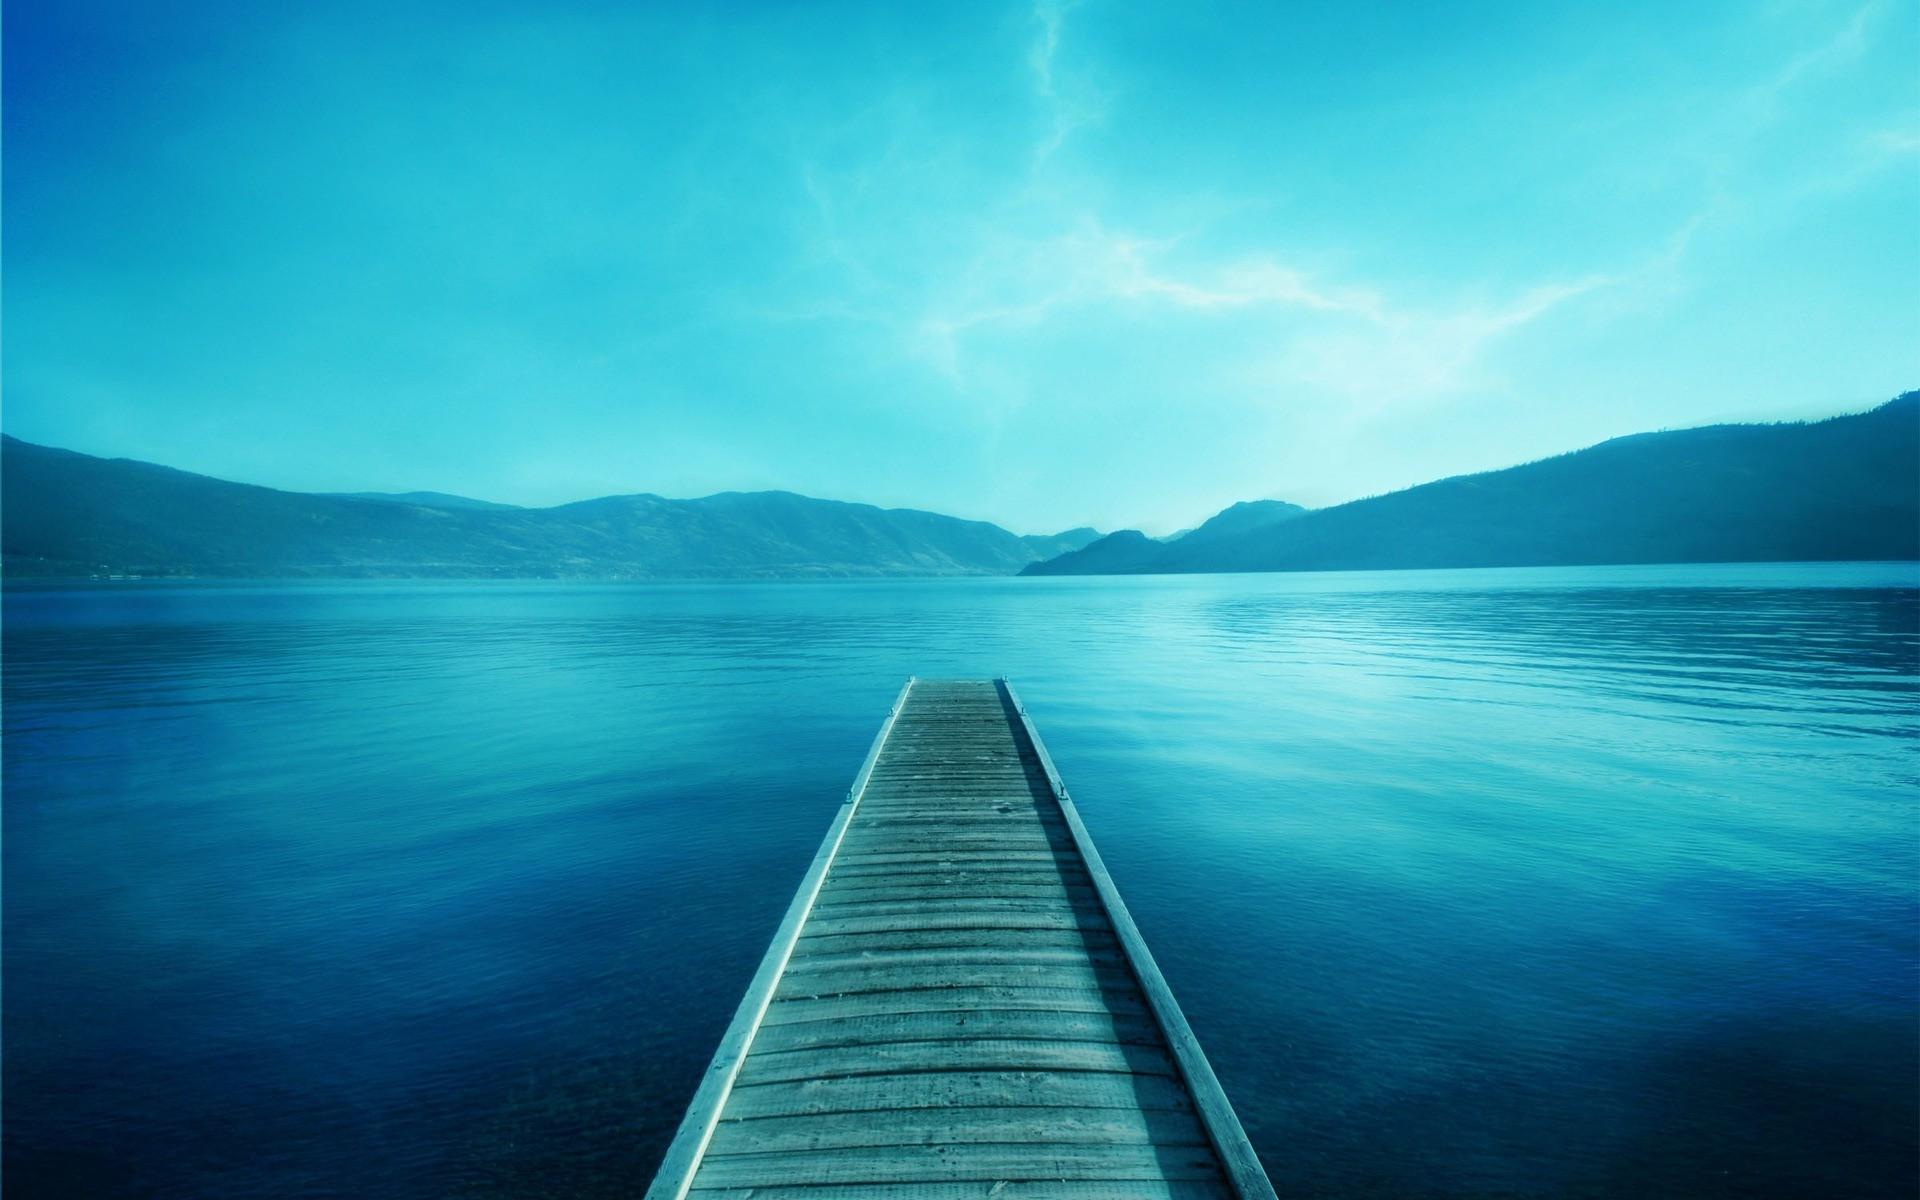 blue, Photography, Lake, Water, Pier, Landscape Wallpapers ...Lake Water Wallpaper